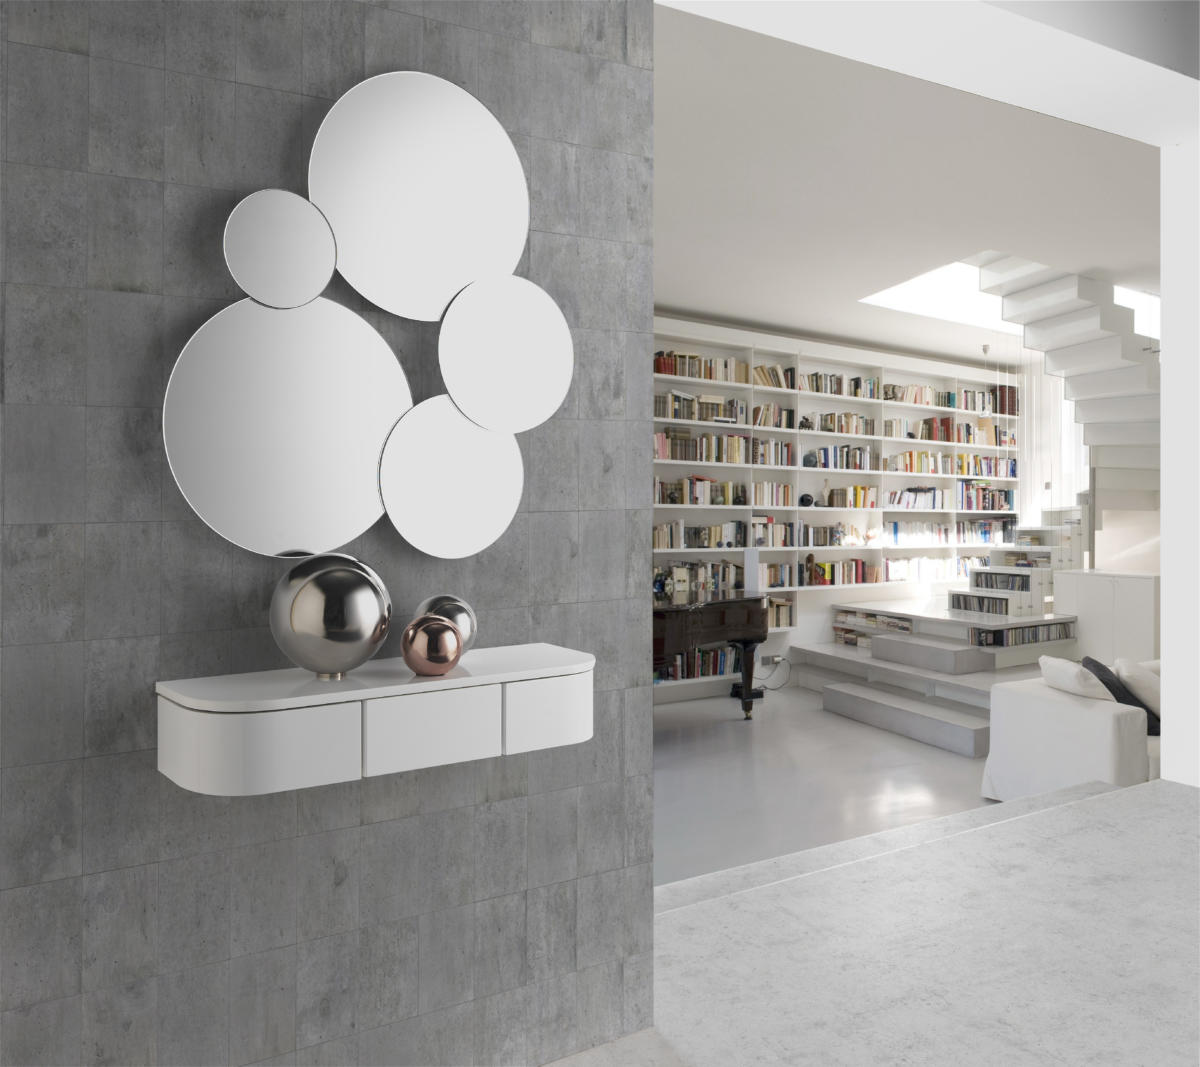 auxiliar-espejo-muebles-amaya-05